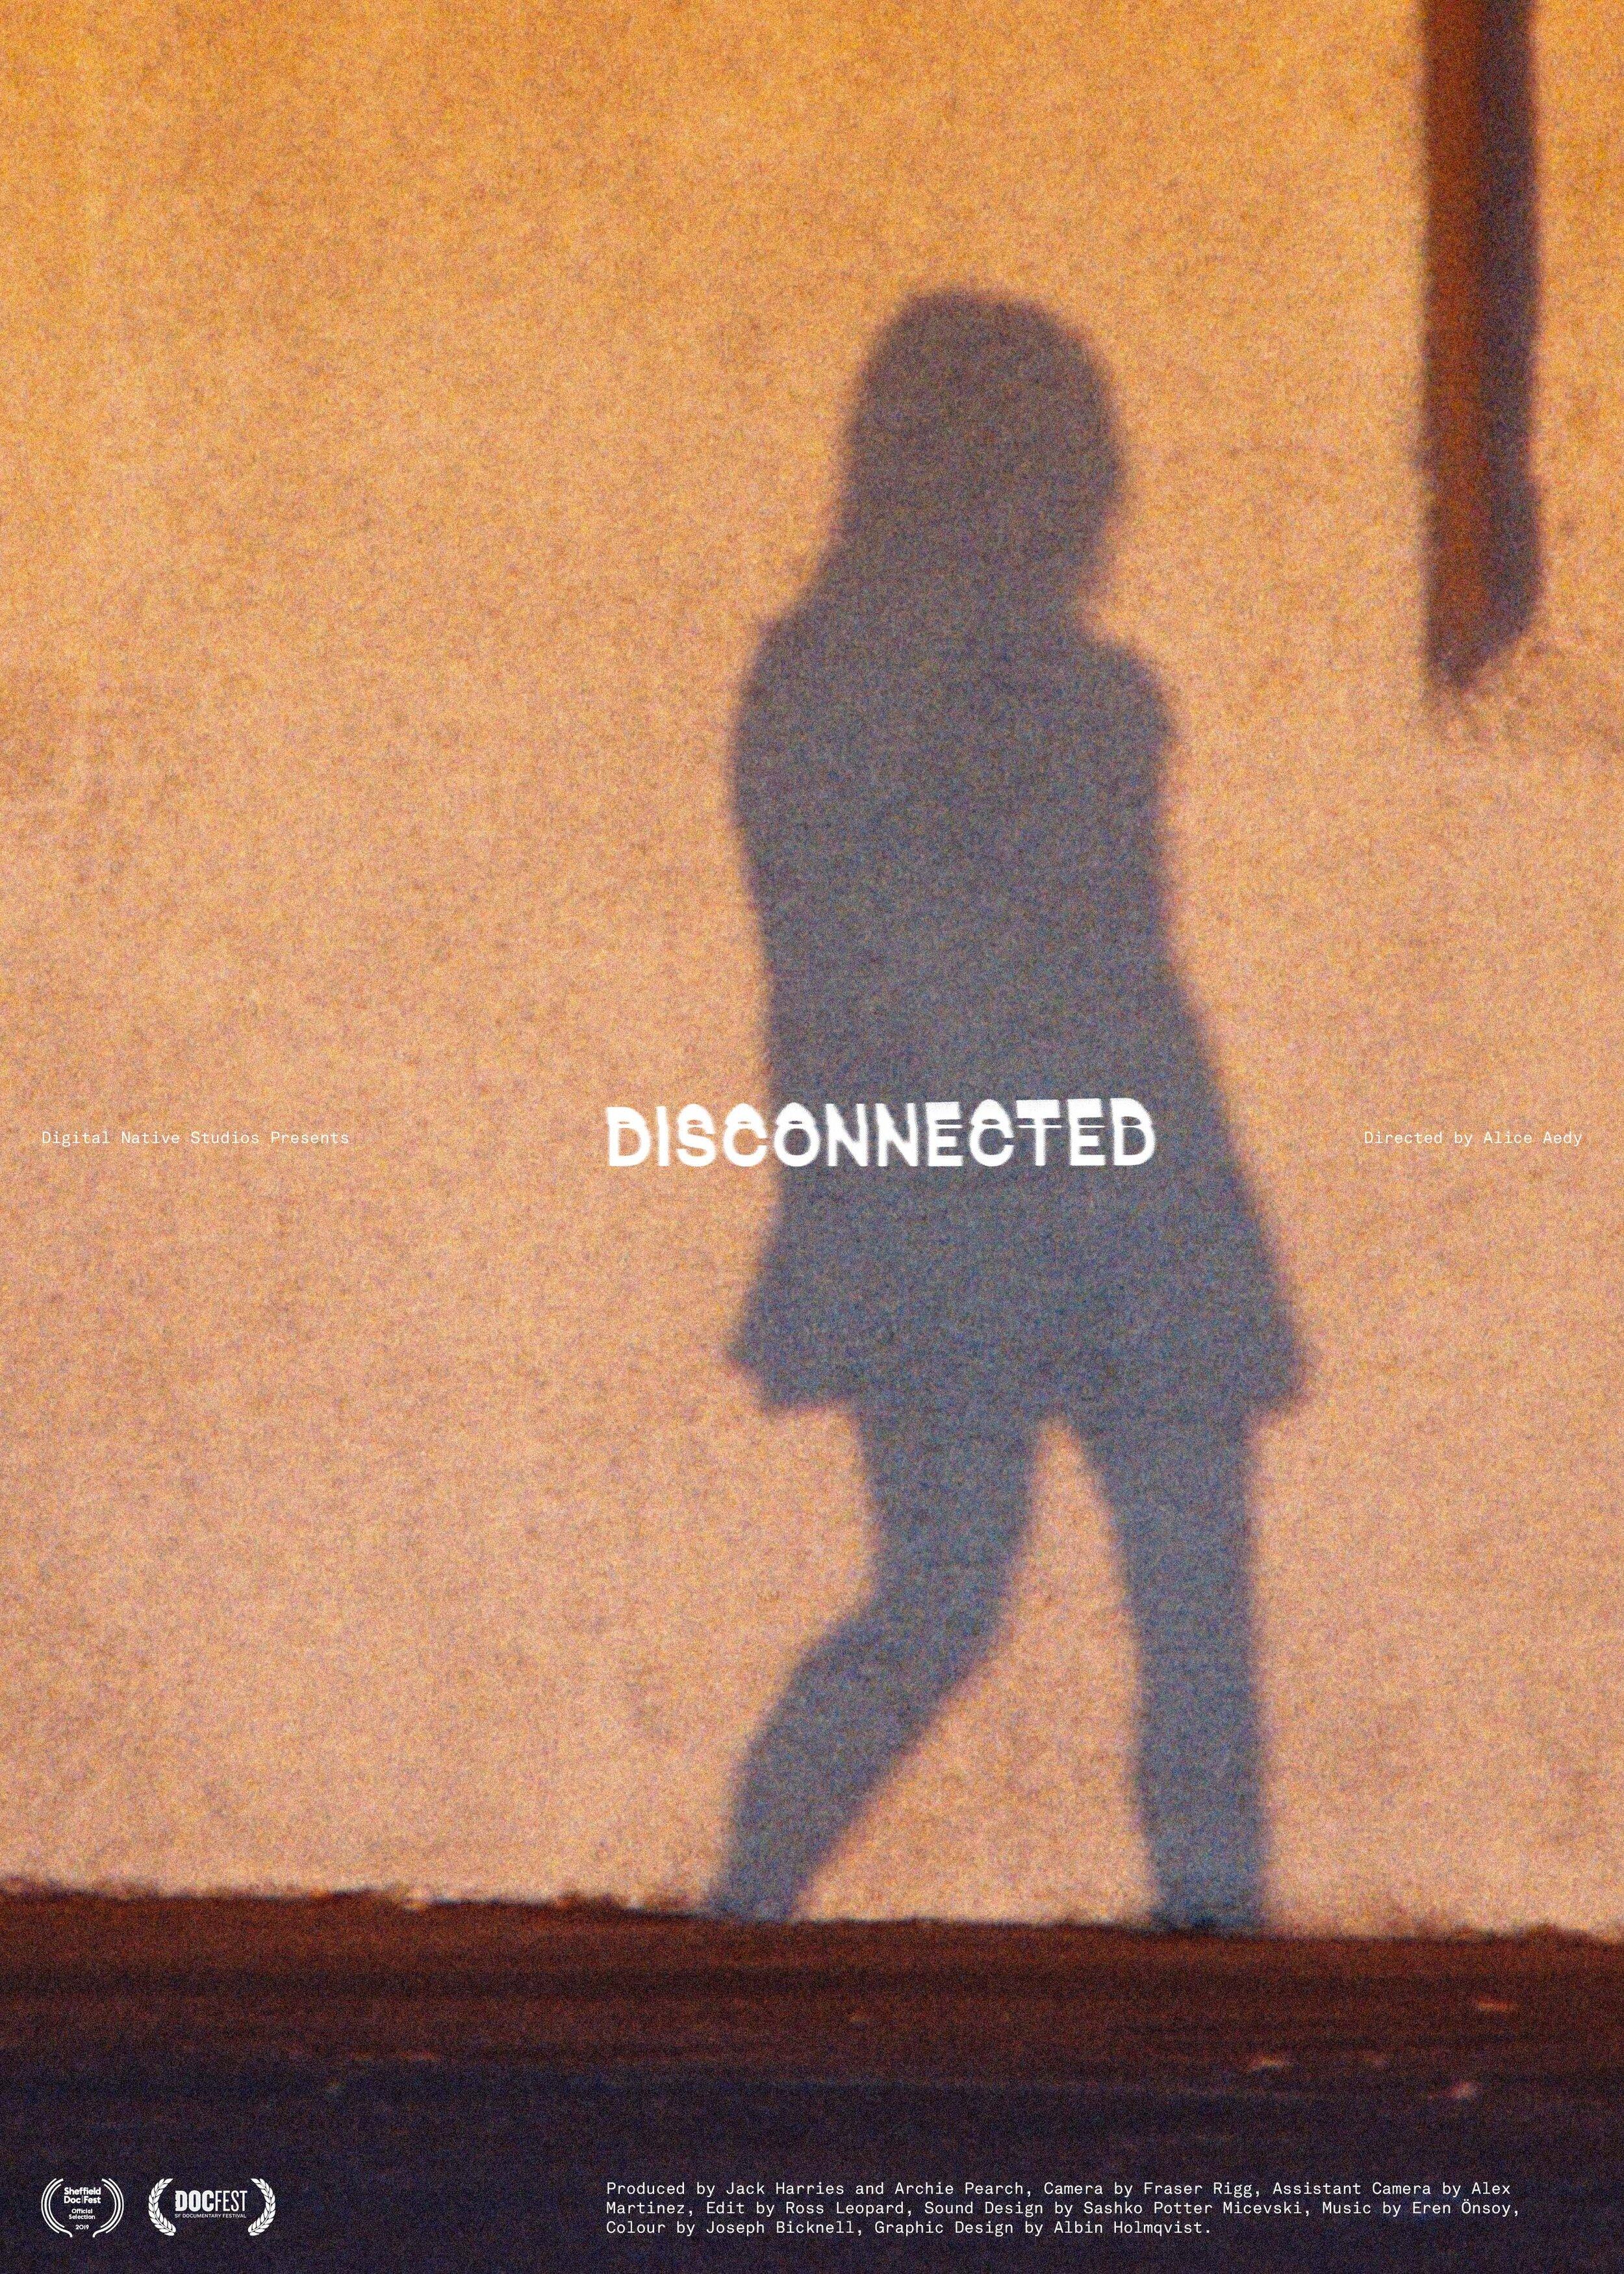 SAH_DISCONNECTED_POSTER04-2.jpg